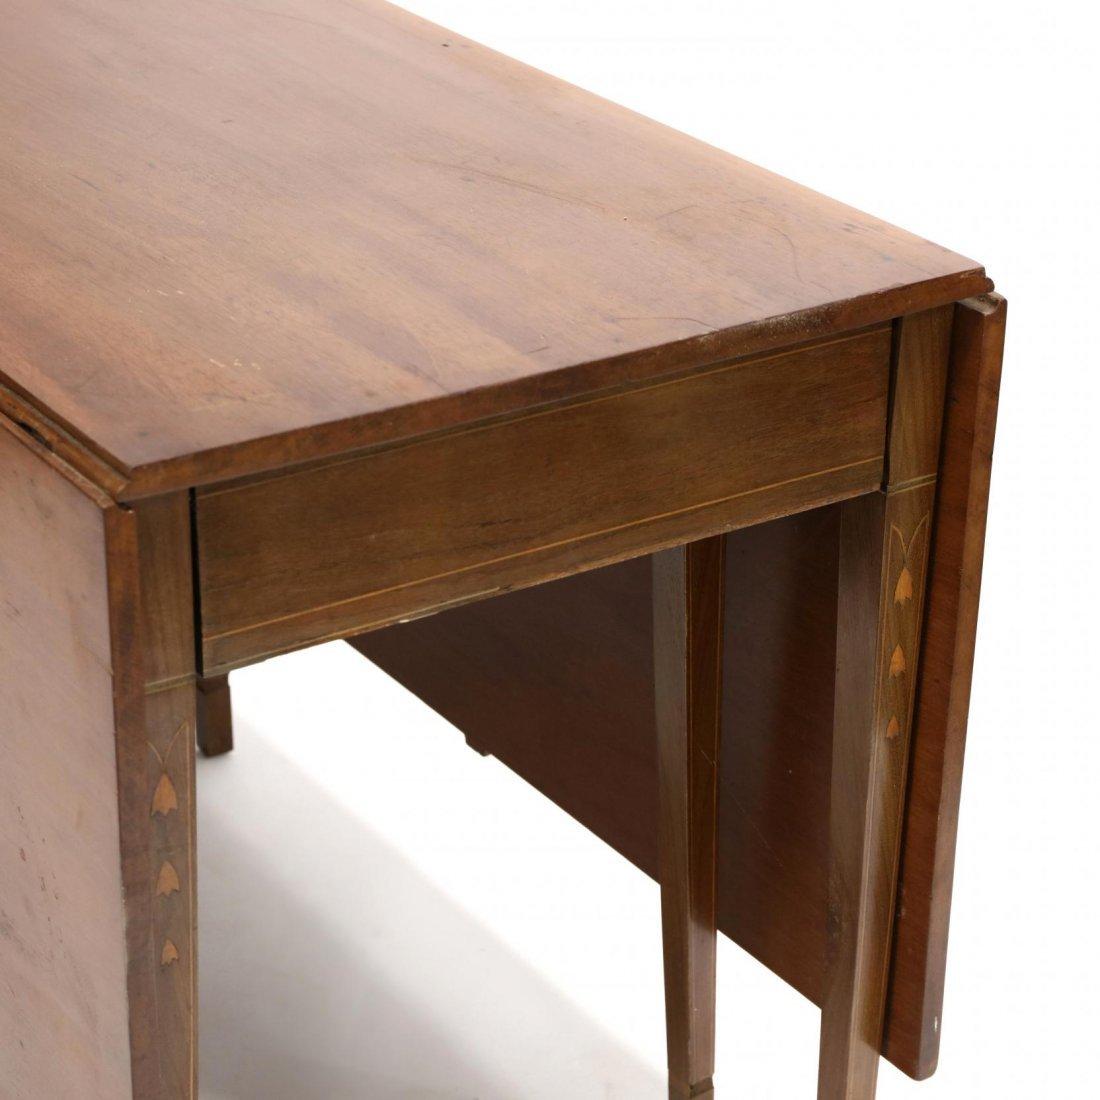 Federal Inlaid Drop Leaf Dining Table - 3